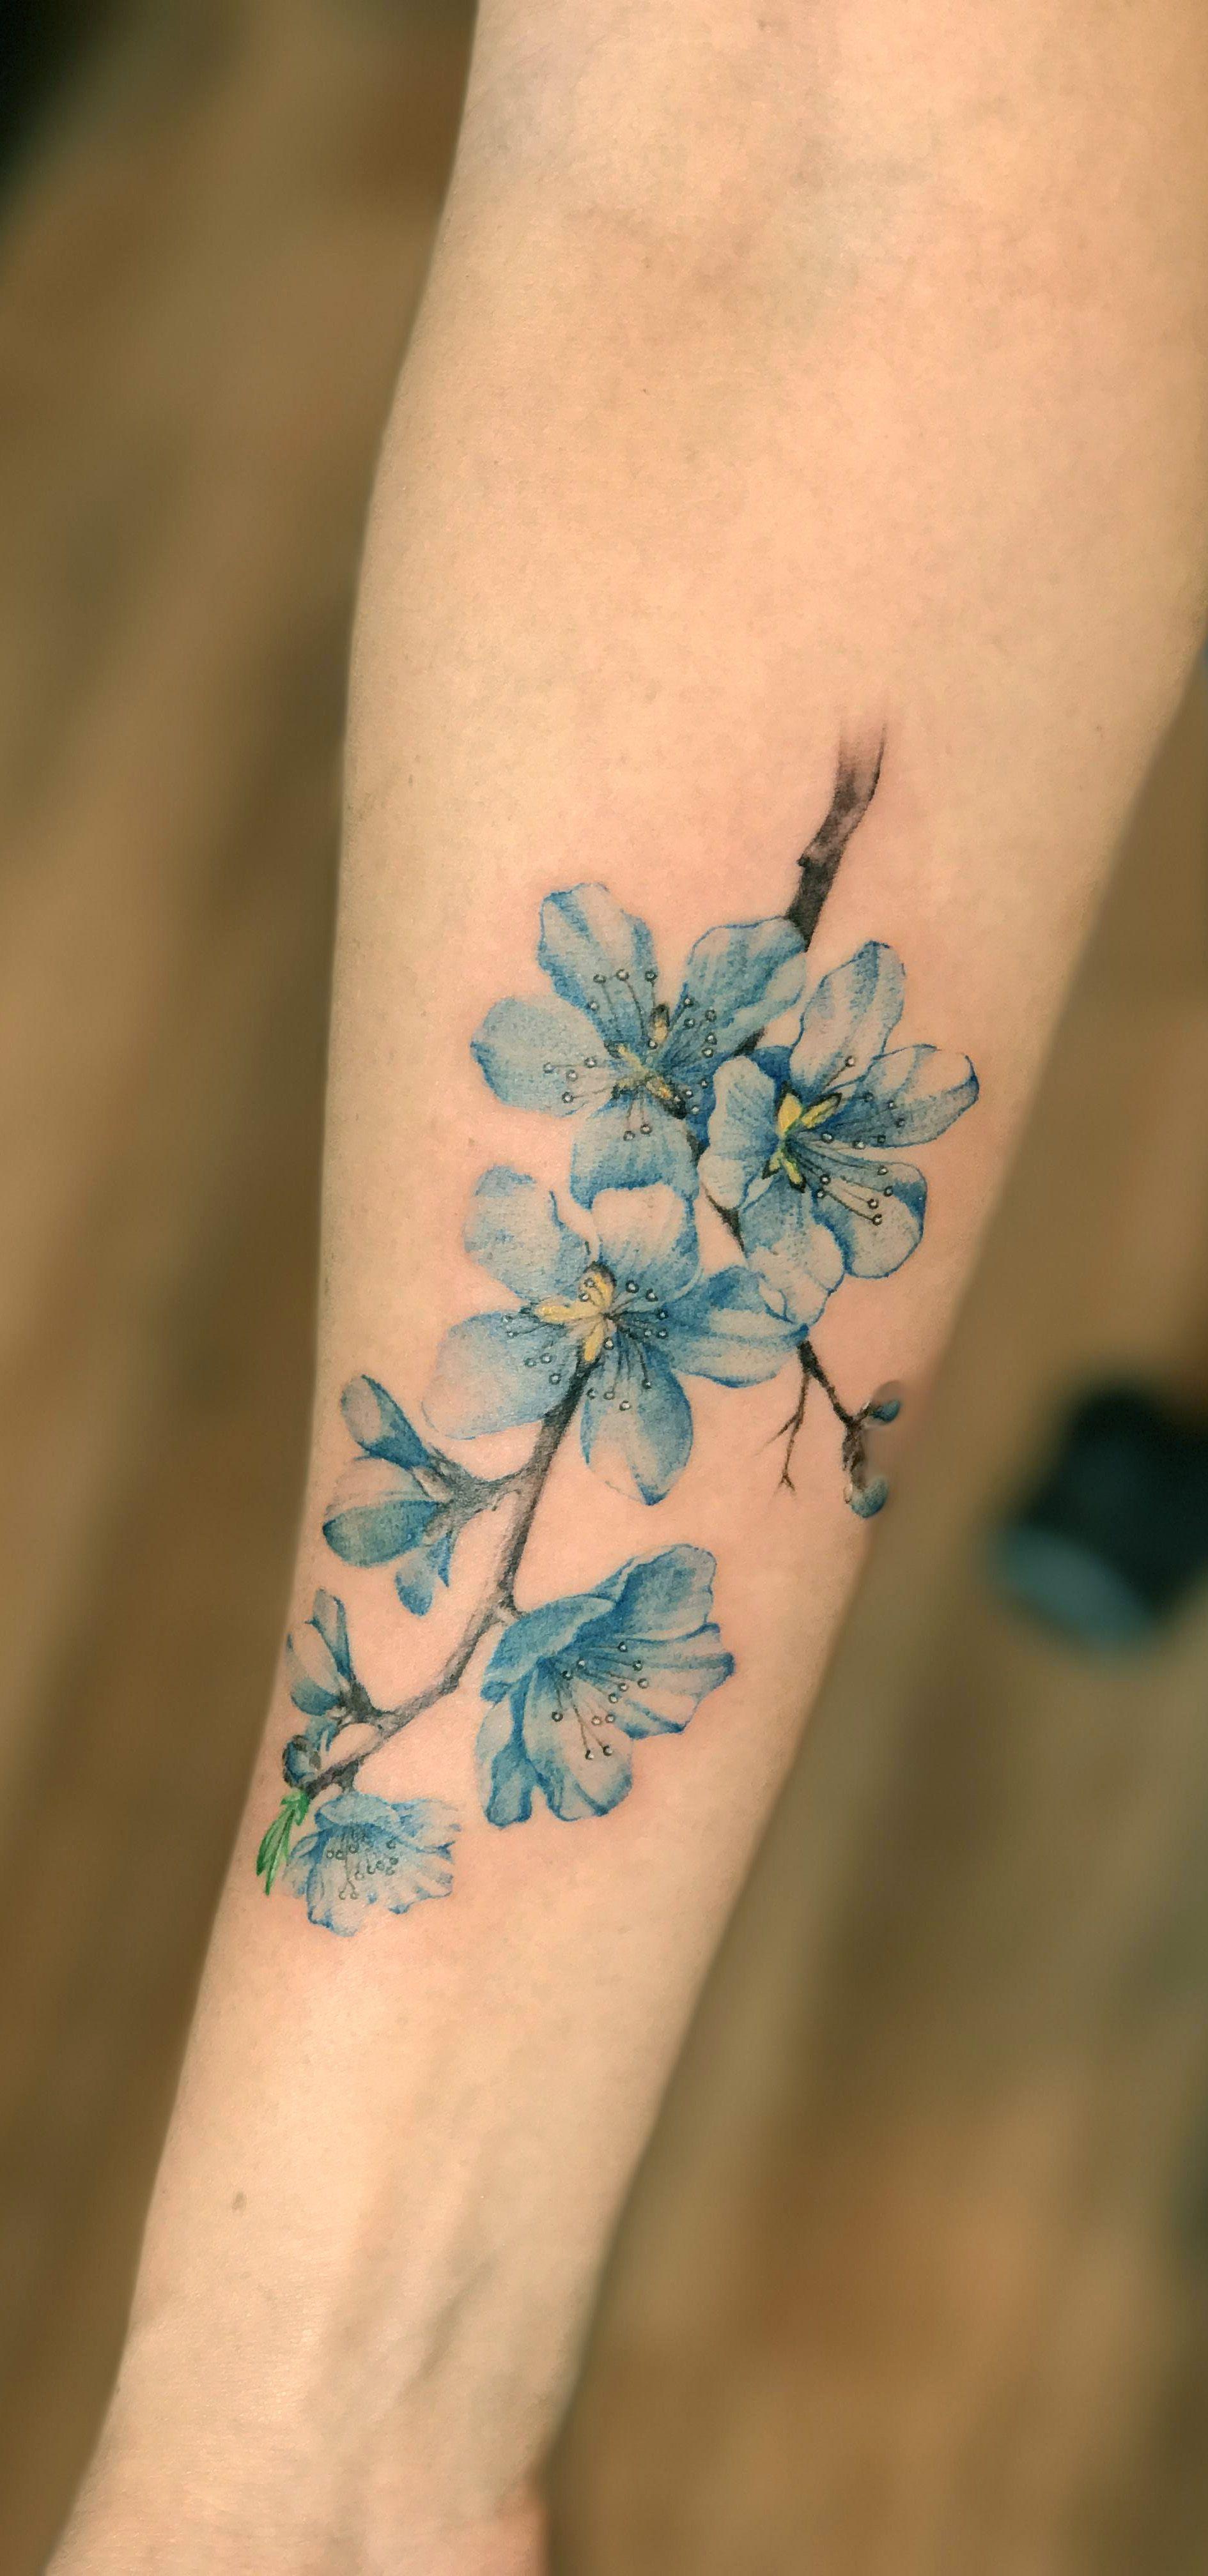 Blue flowers tattoo by jay shin black fish tattoo nyc flowers blue flowers tattoo by jay shin black fish tattoo nyc izmirmasajfo